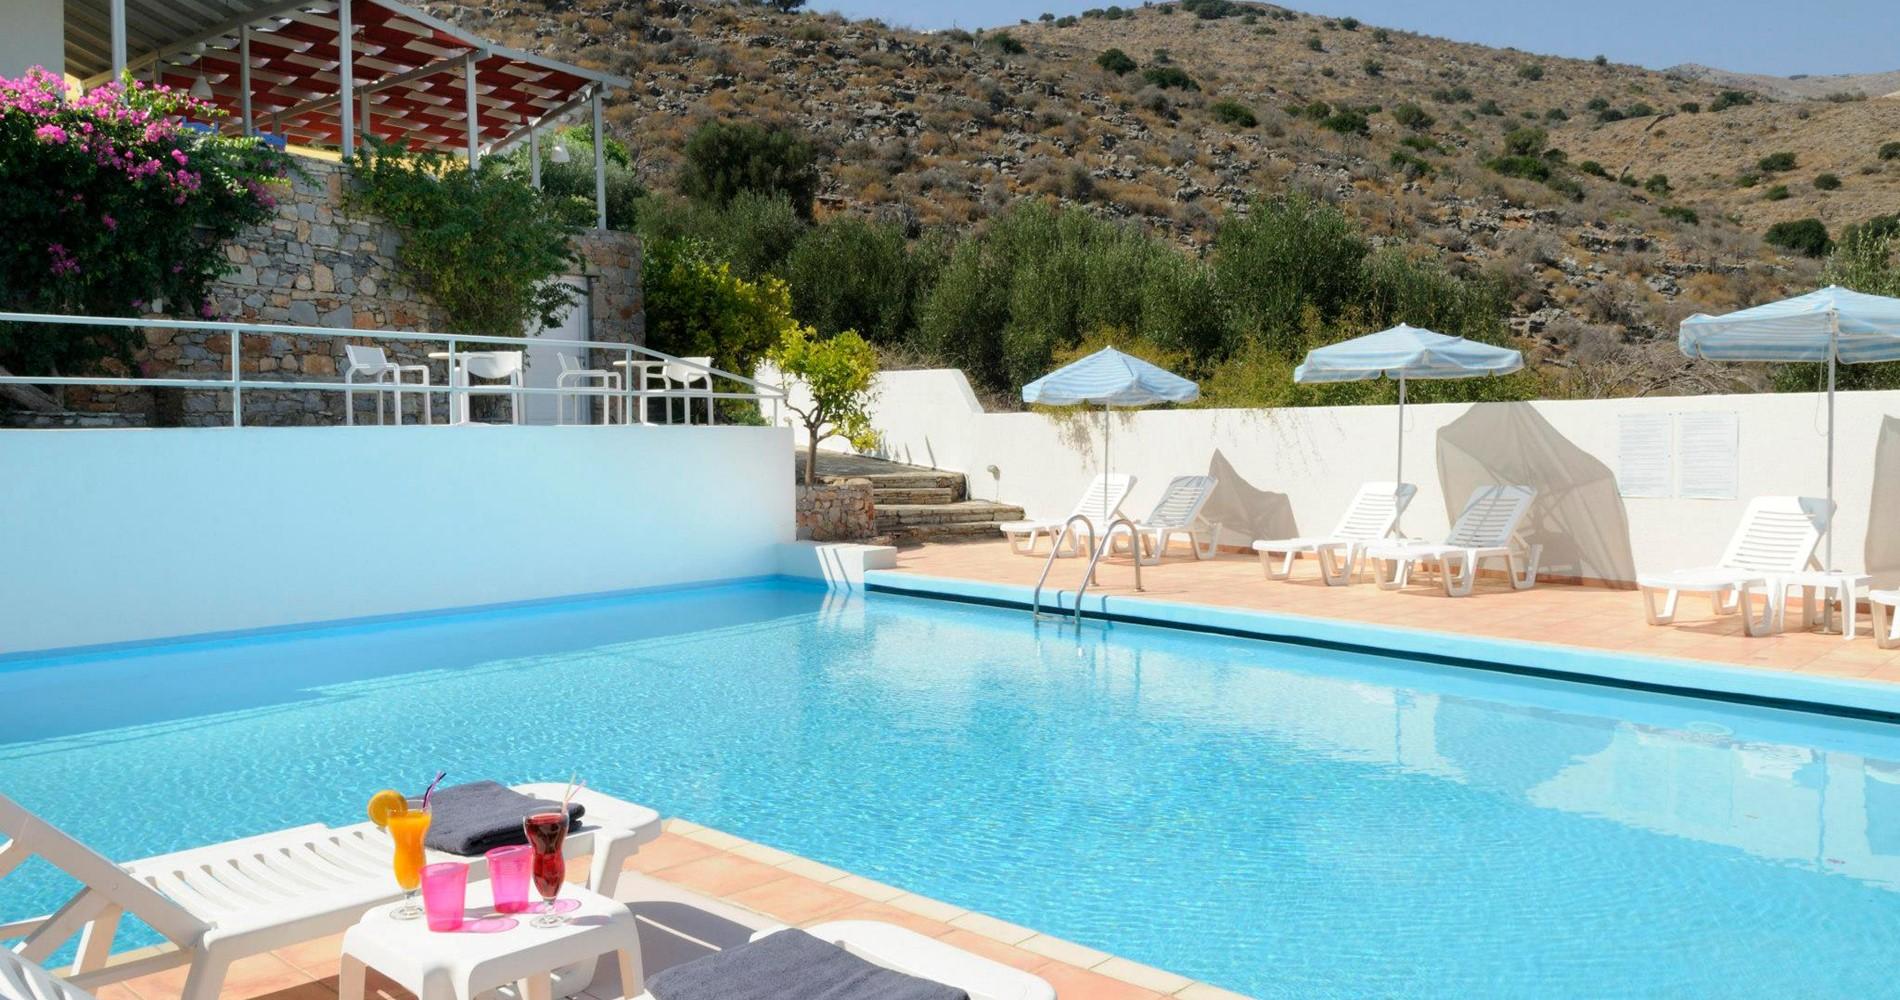 Official website of selena hotel elounda village hotel elounda accommodation elounda crete for Swimming pool technician salary